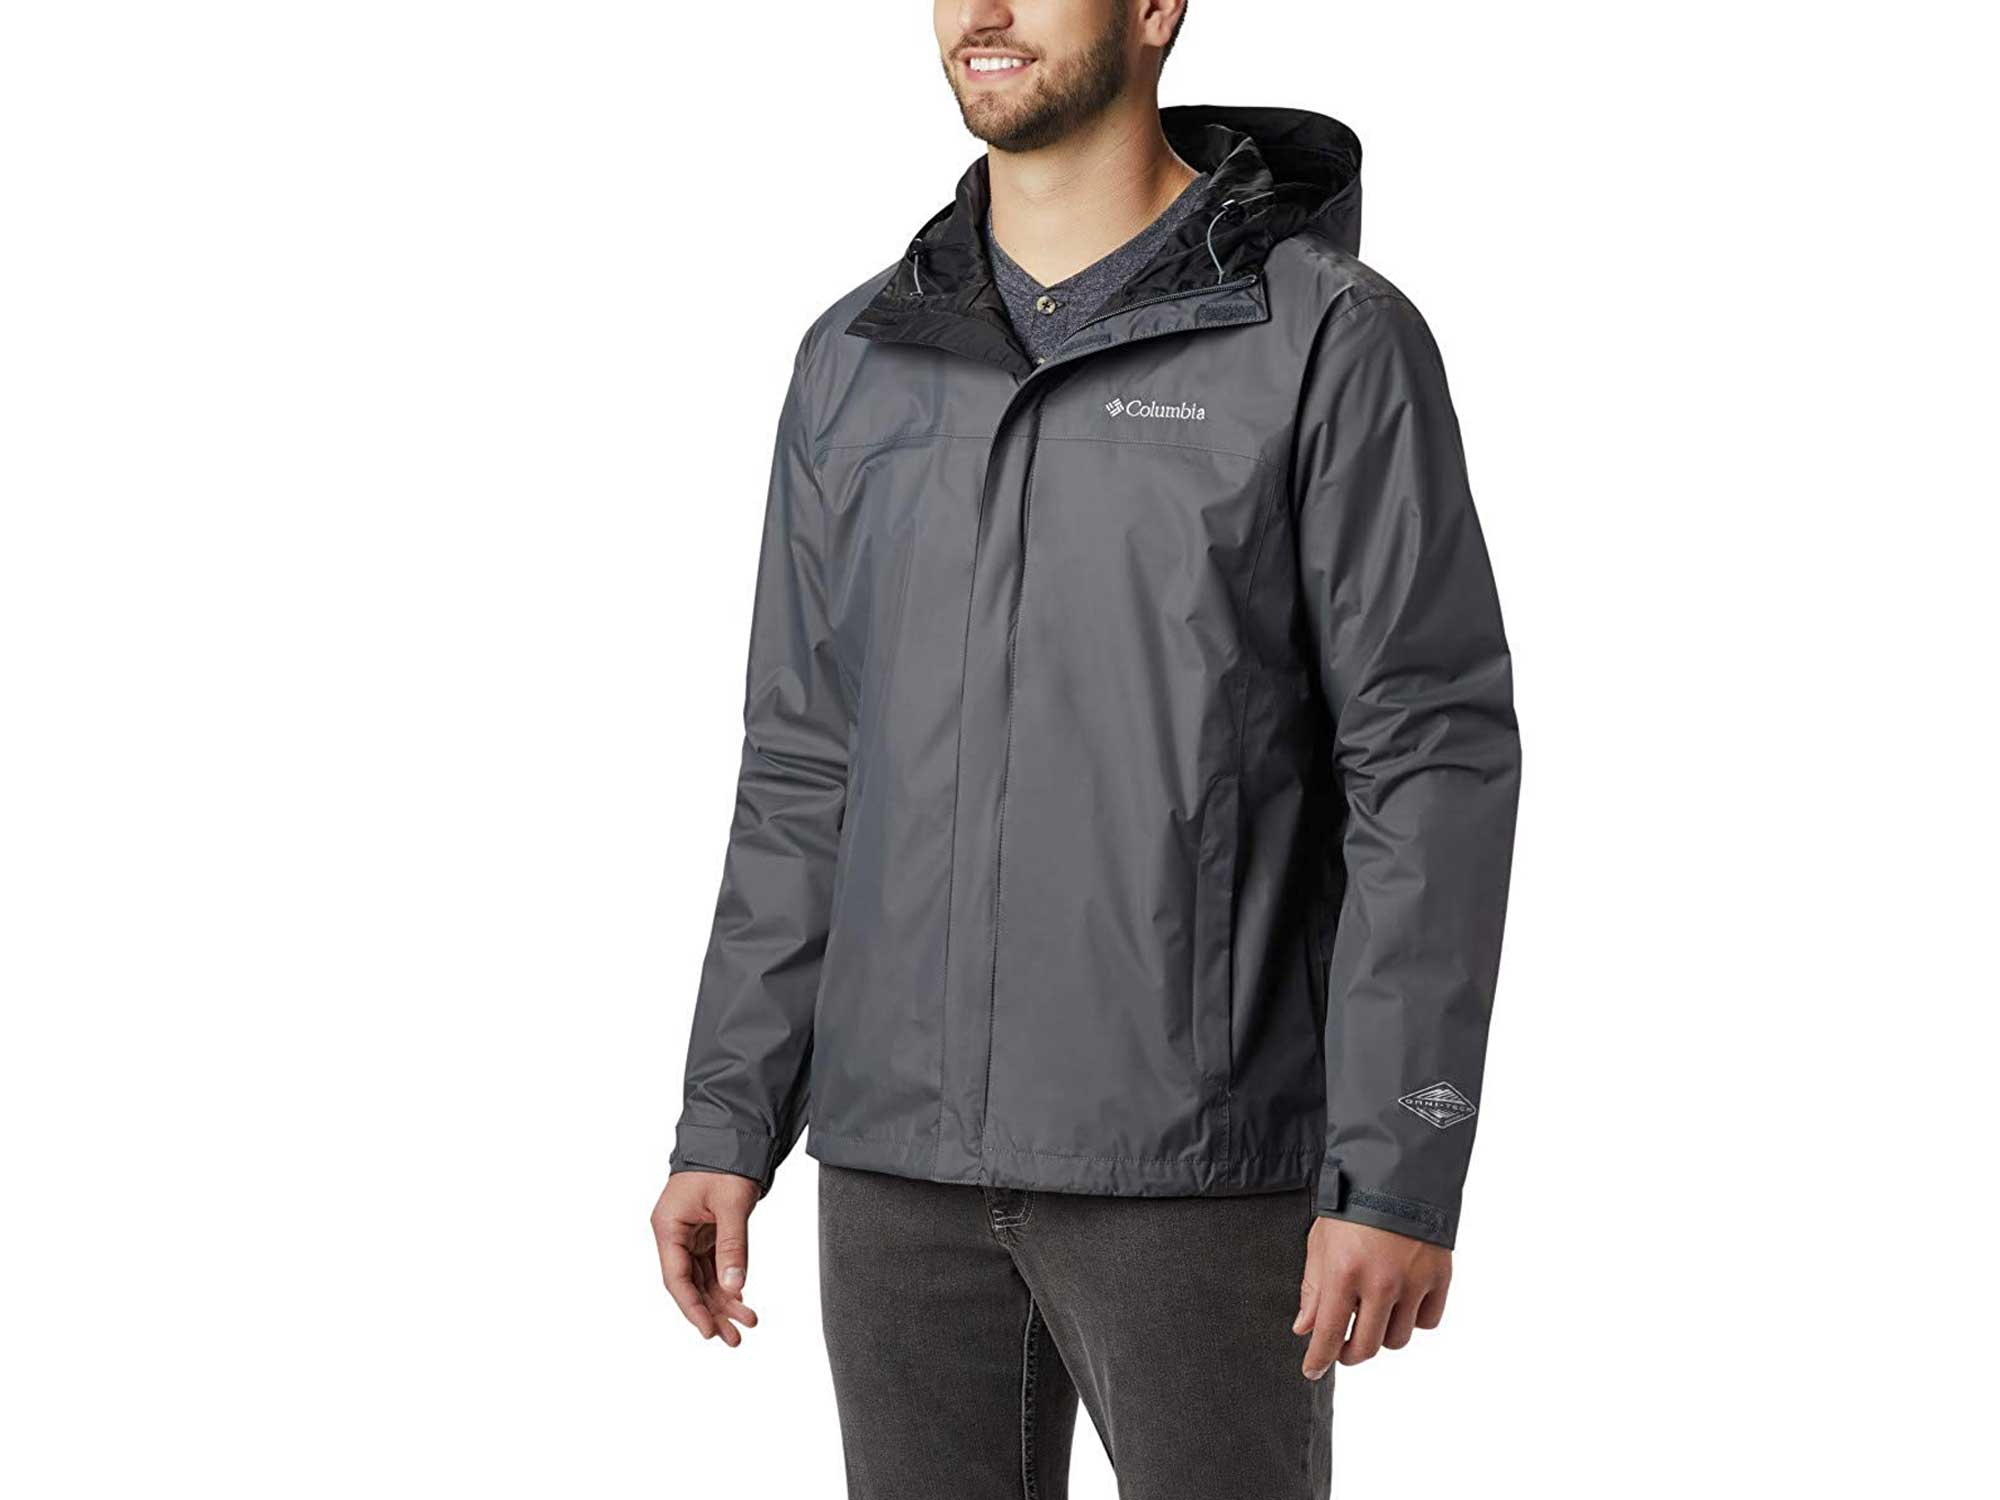 Man wearing grey Columbia rain jacket